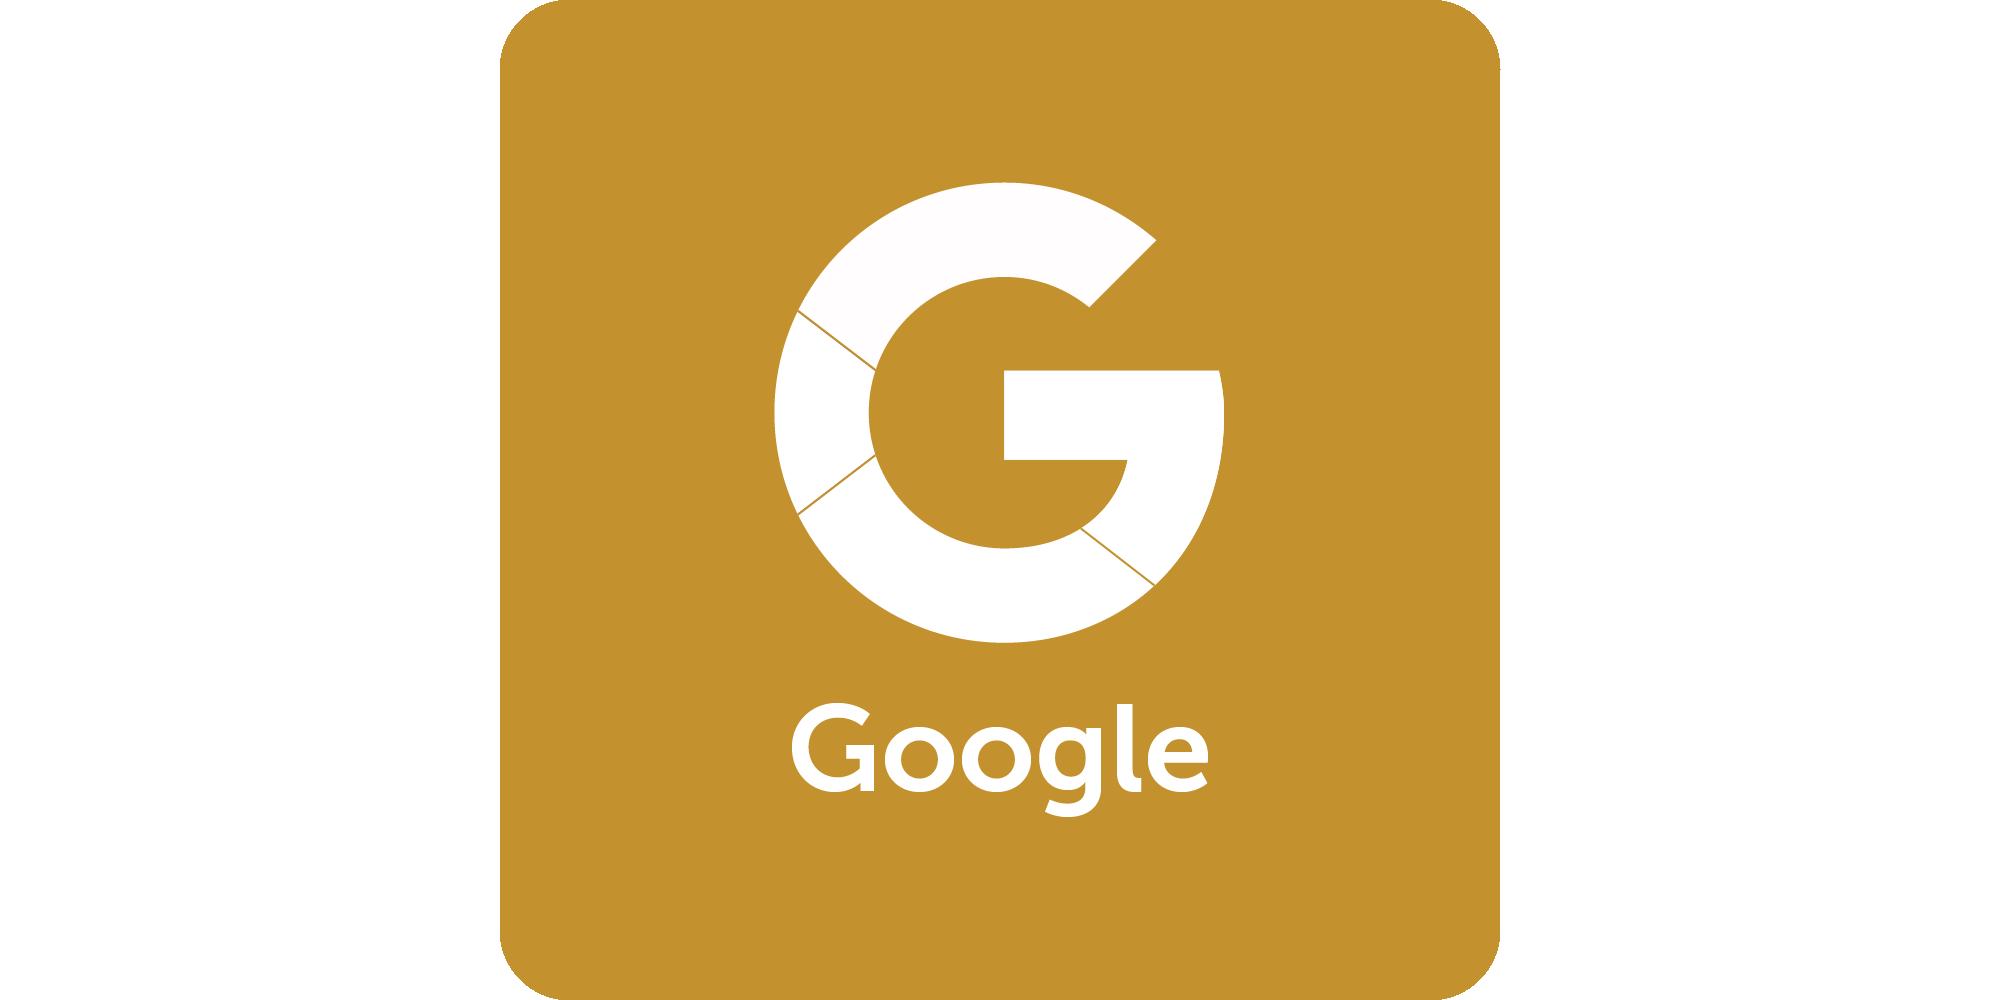 Google_Canoe.png